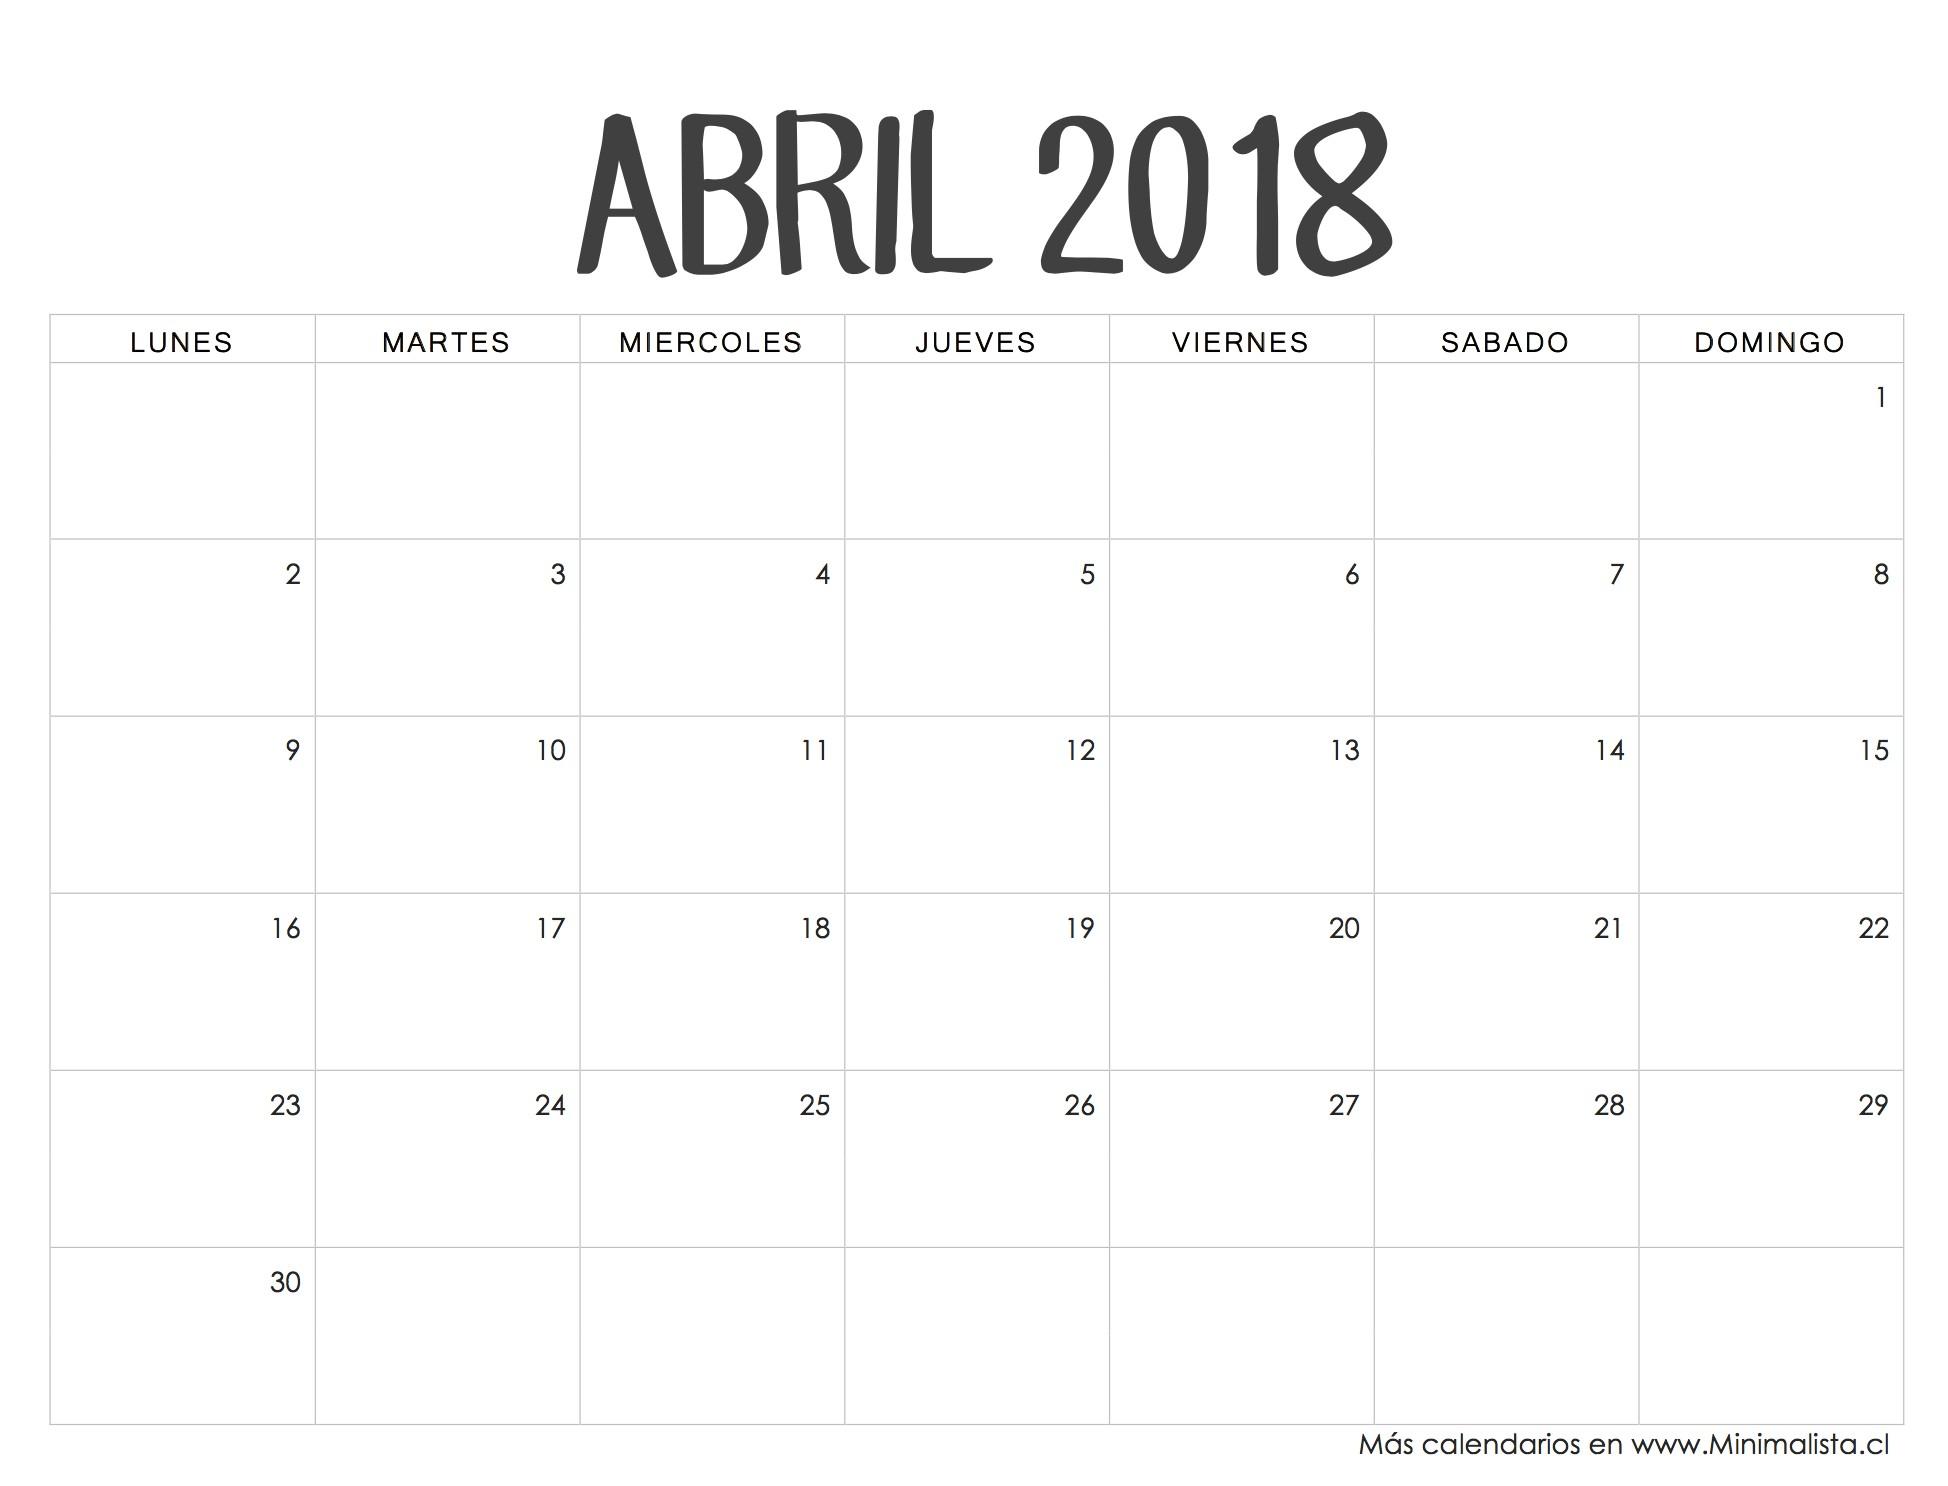 Calendario Mes Dezembro 2017 Para Imprimir Actual Calendario Abril 2018 Escolares Of Calendario Mes Dezembro 2017 Para Imprimir Más Actual Calendario Lunar 2016 Colombia Festivos Colombia 2016 Nominas